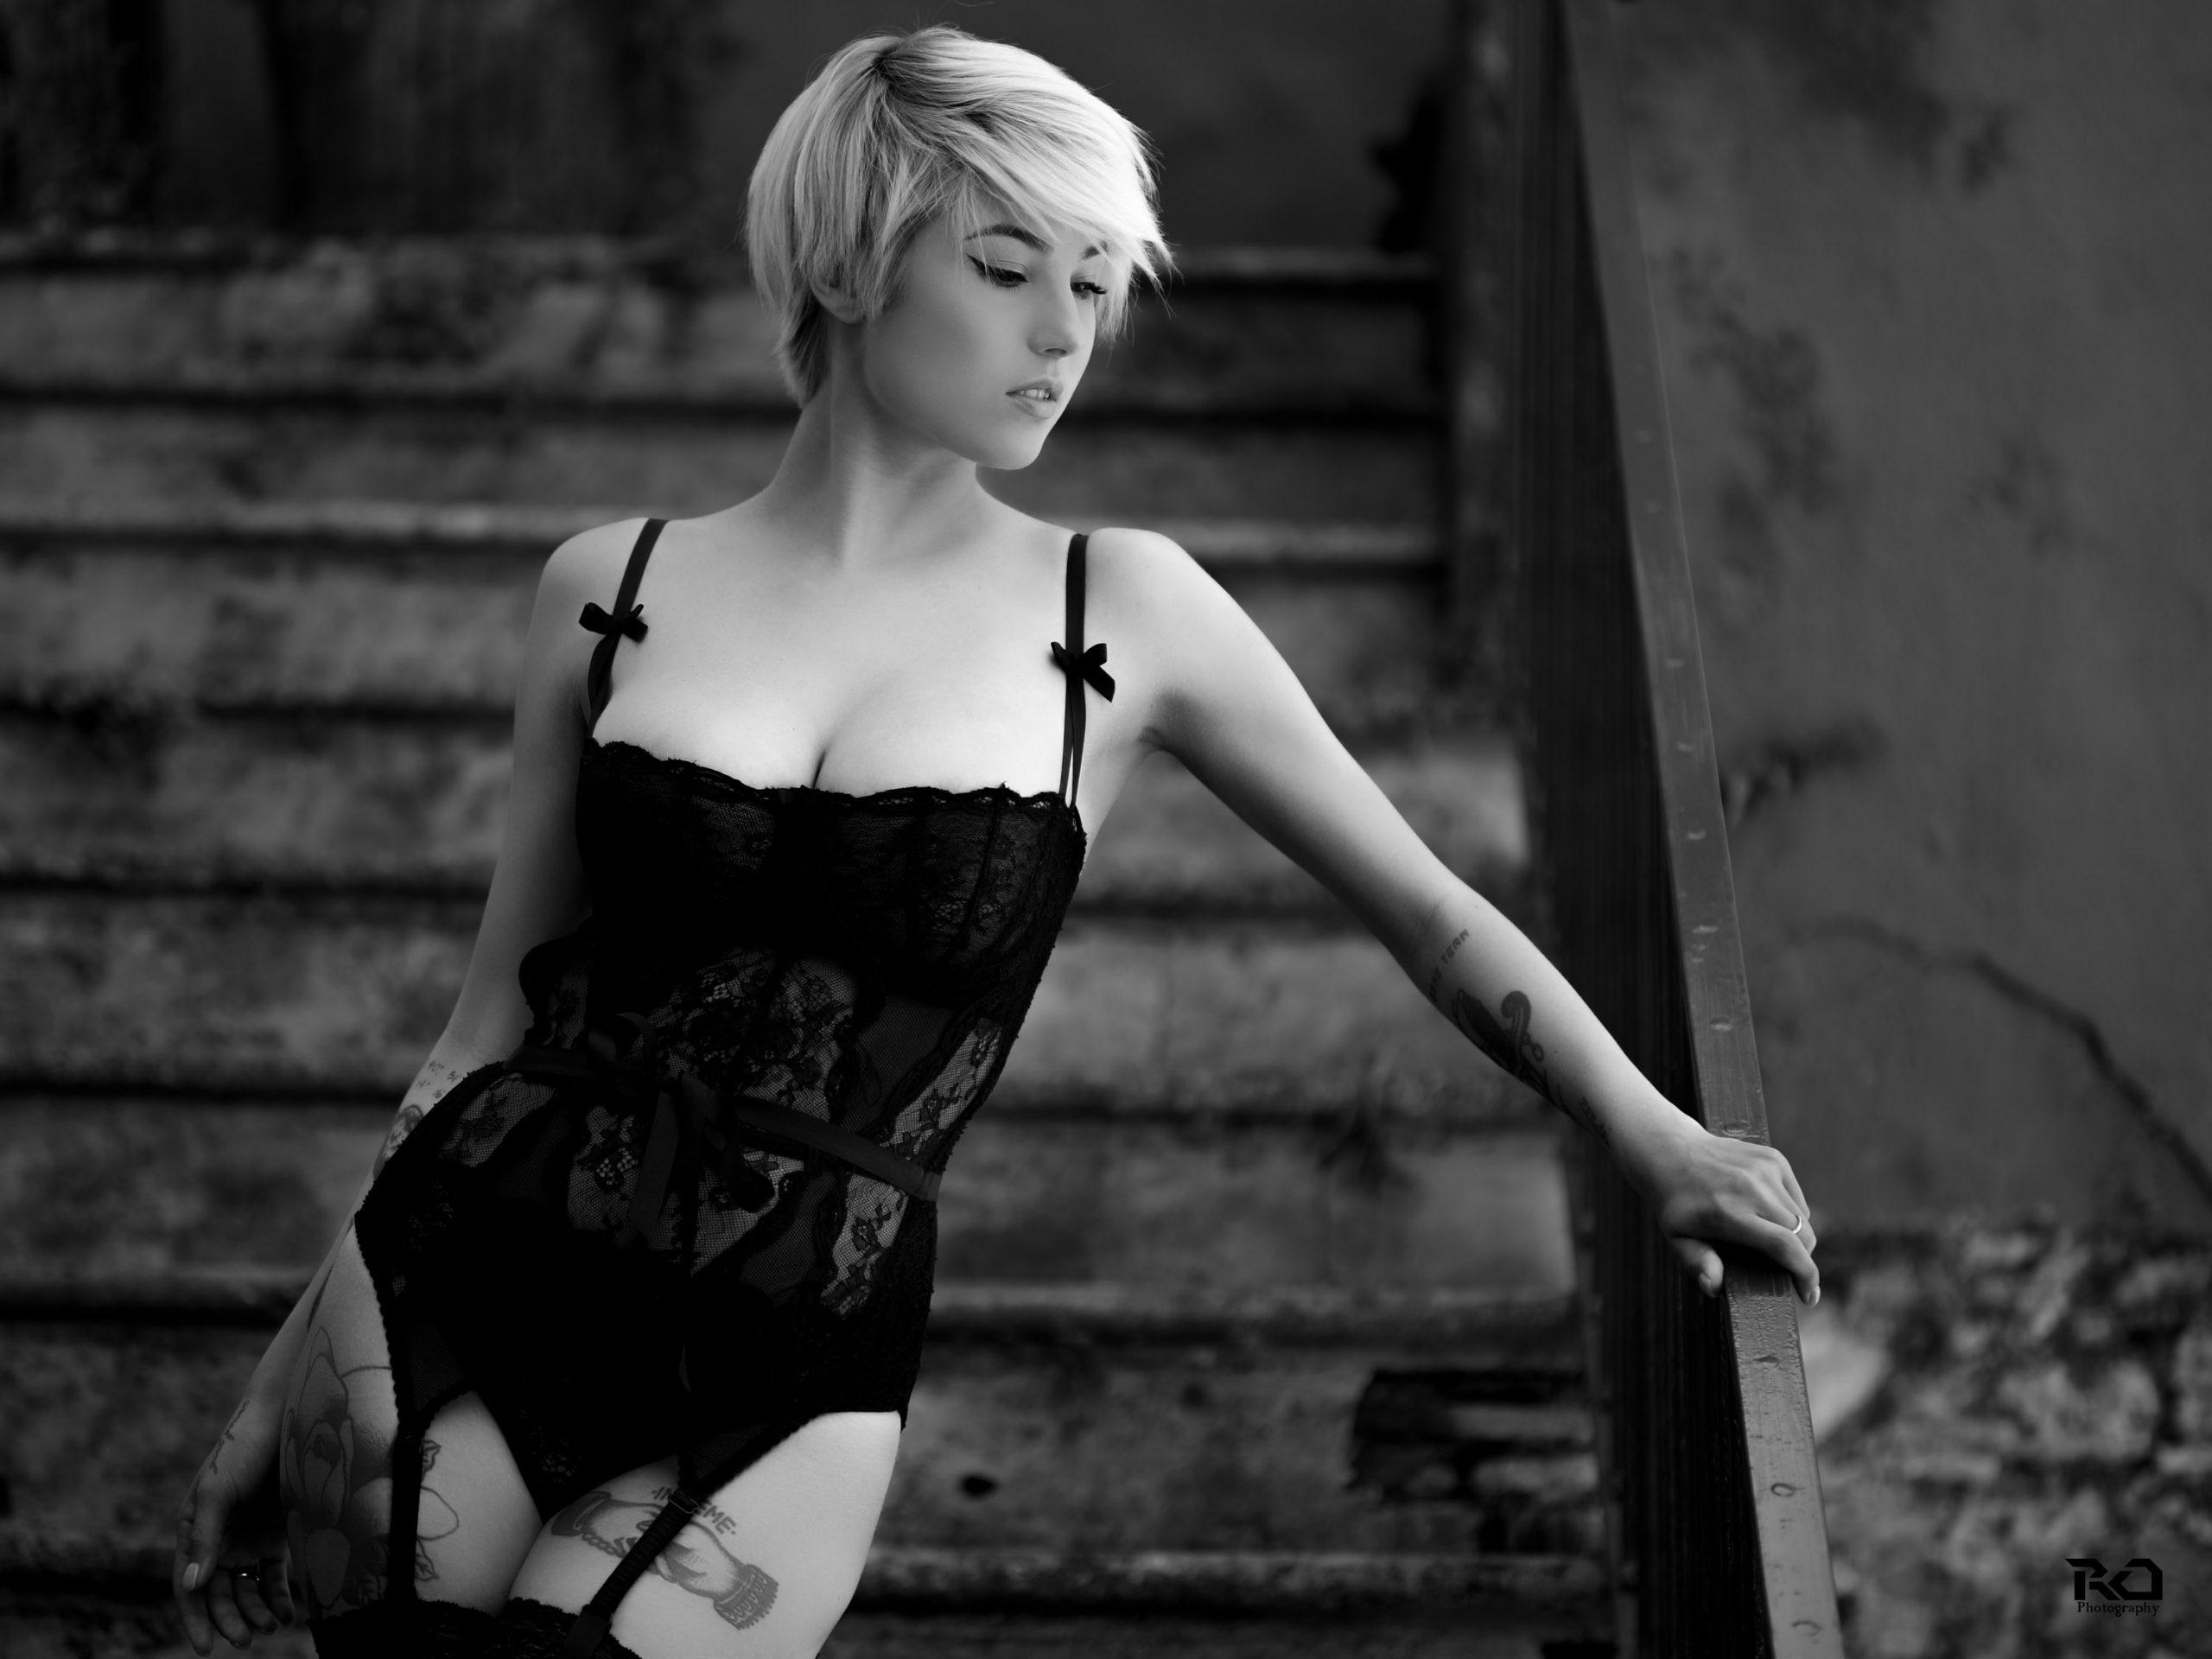 Categorie: Boudoir & Nude, Glamour, Portrait; Photographer: ROBERTO OPPEDISANO PH; Model: GIORGIA SOLERI; Location: Cosenza (CS)